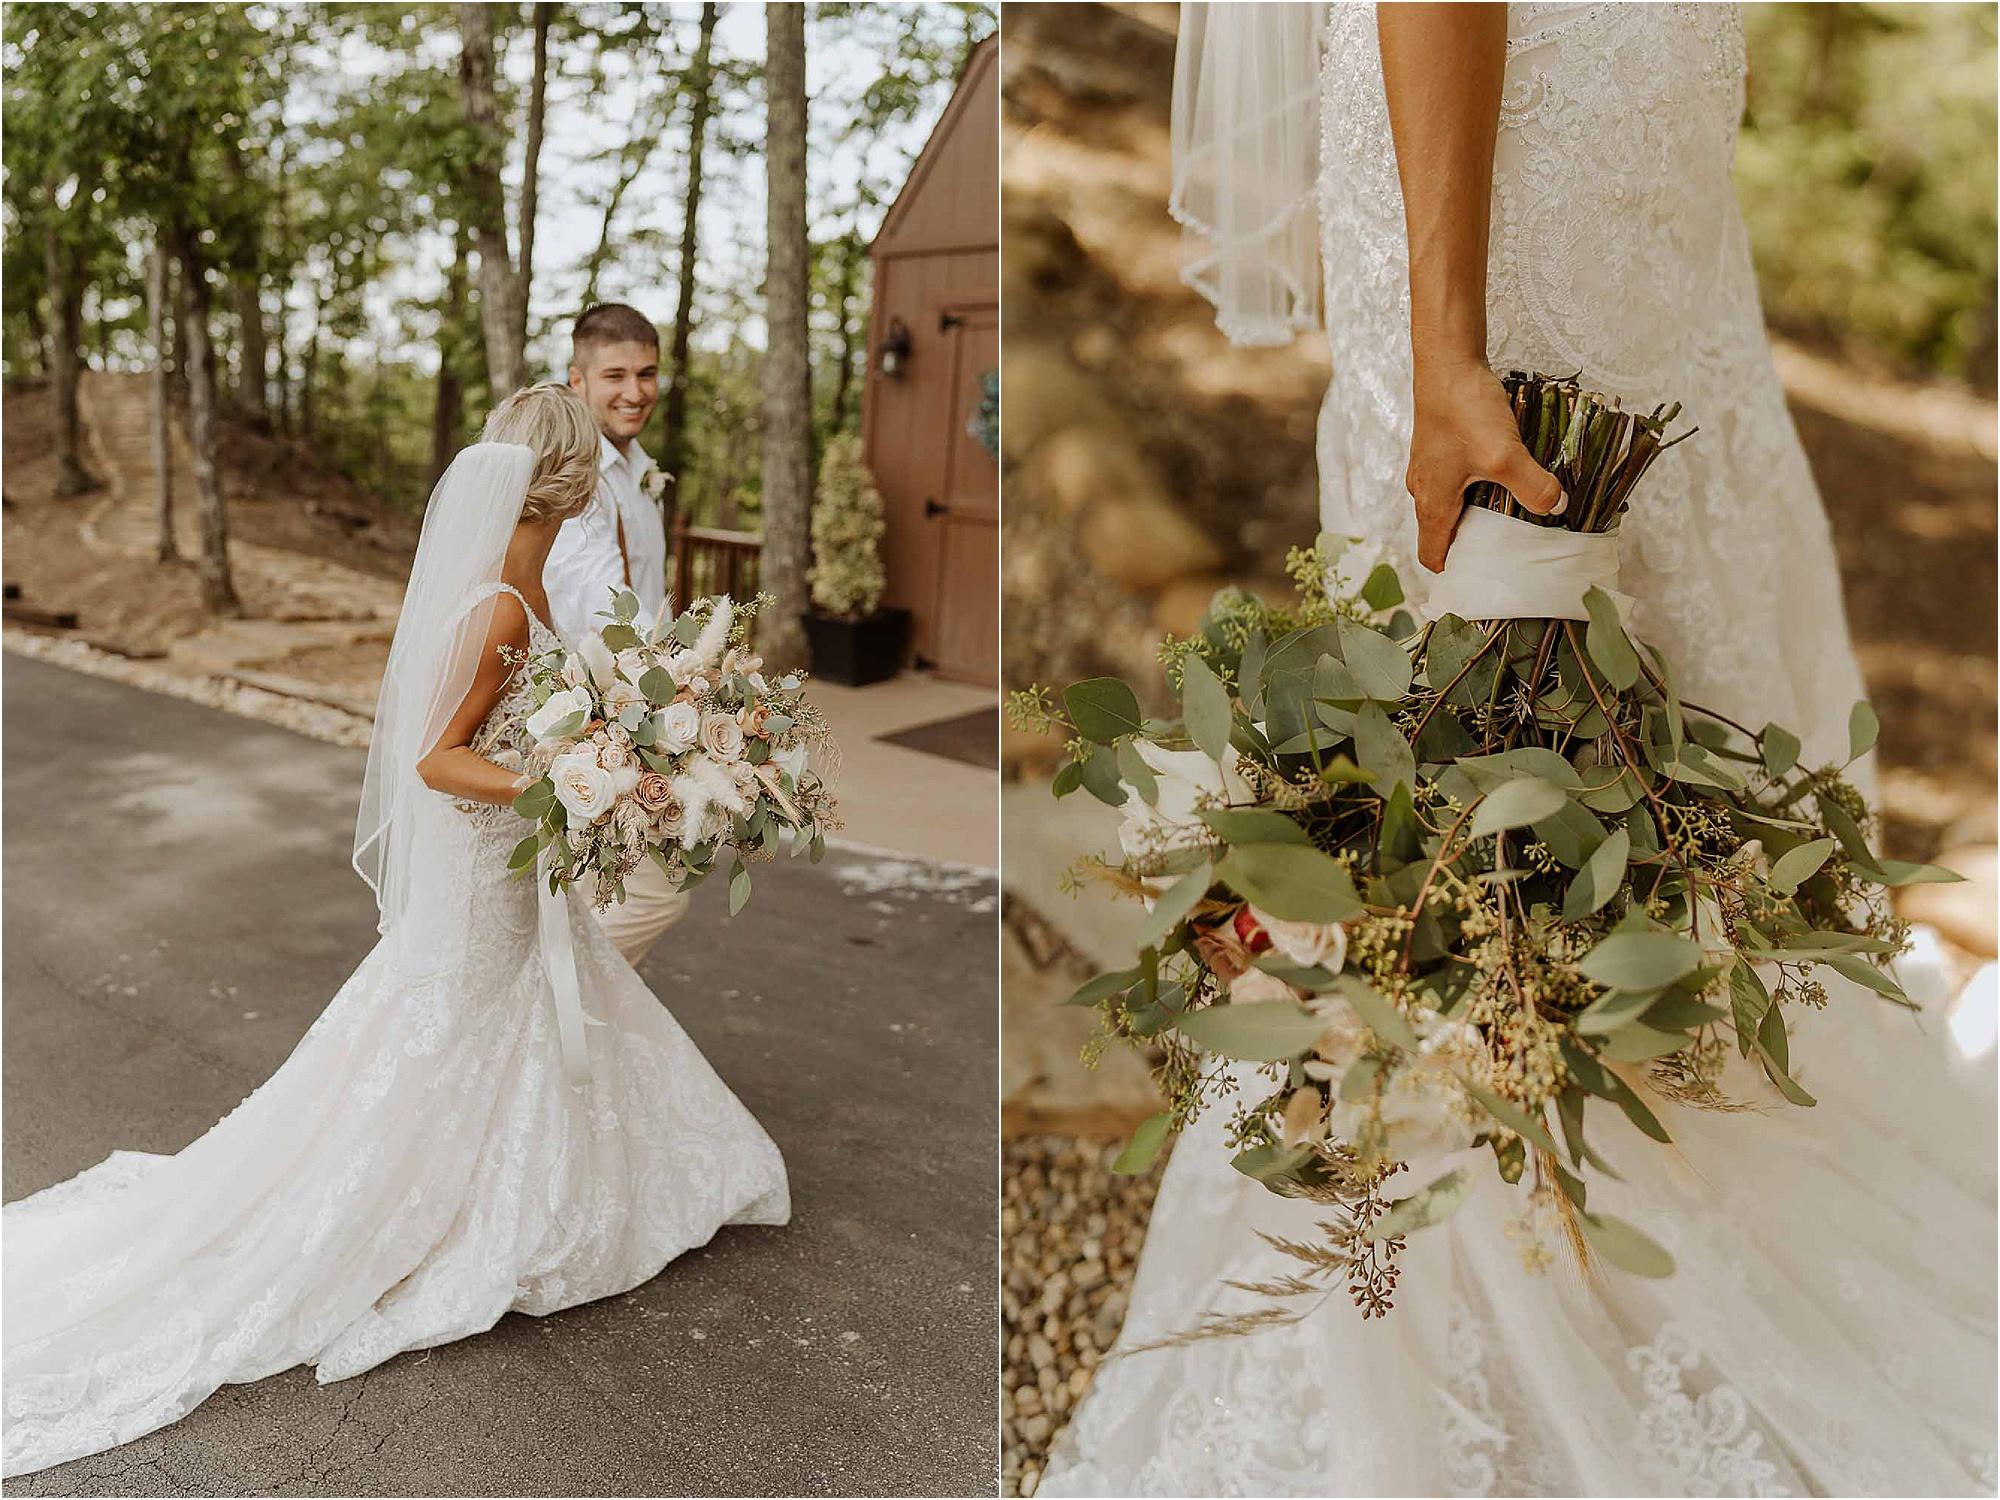 bride and groom walk down wedding aisle at summer wedding